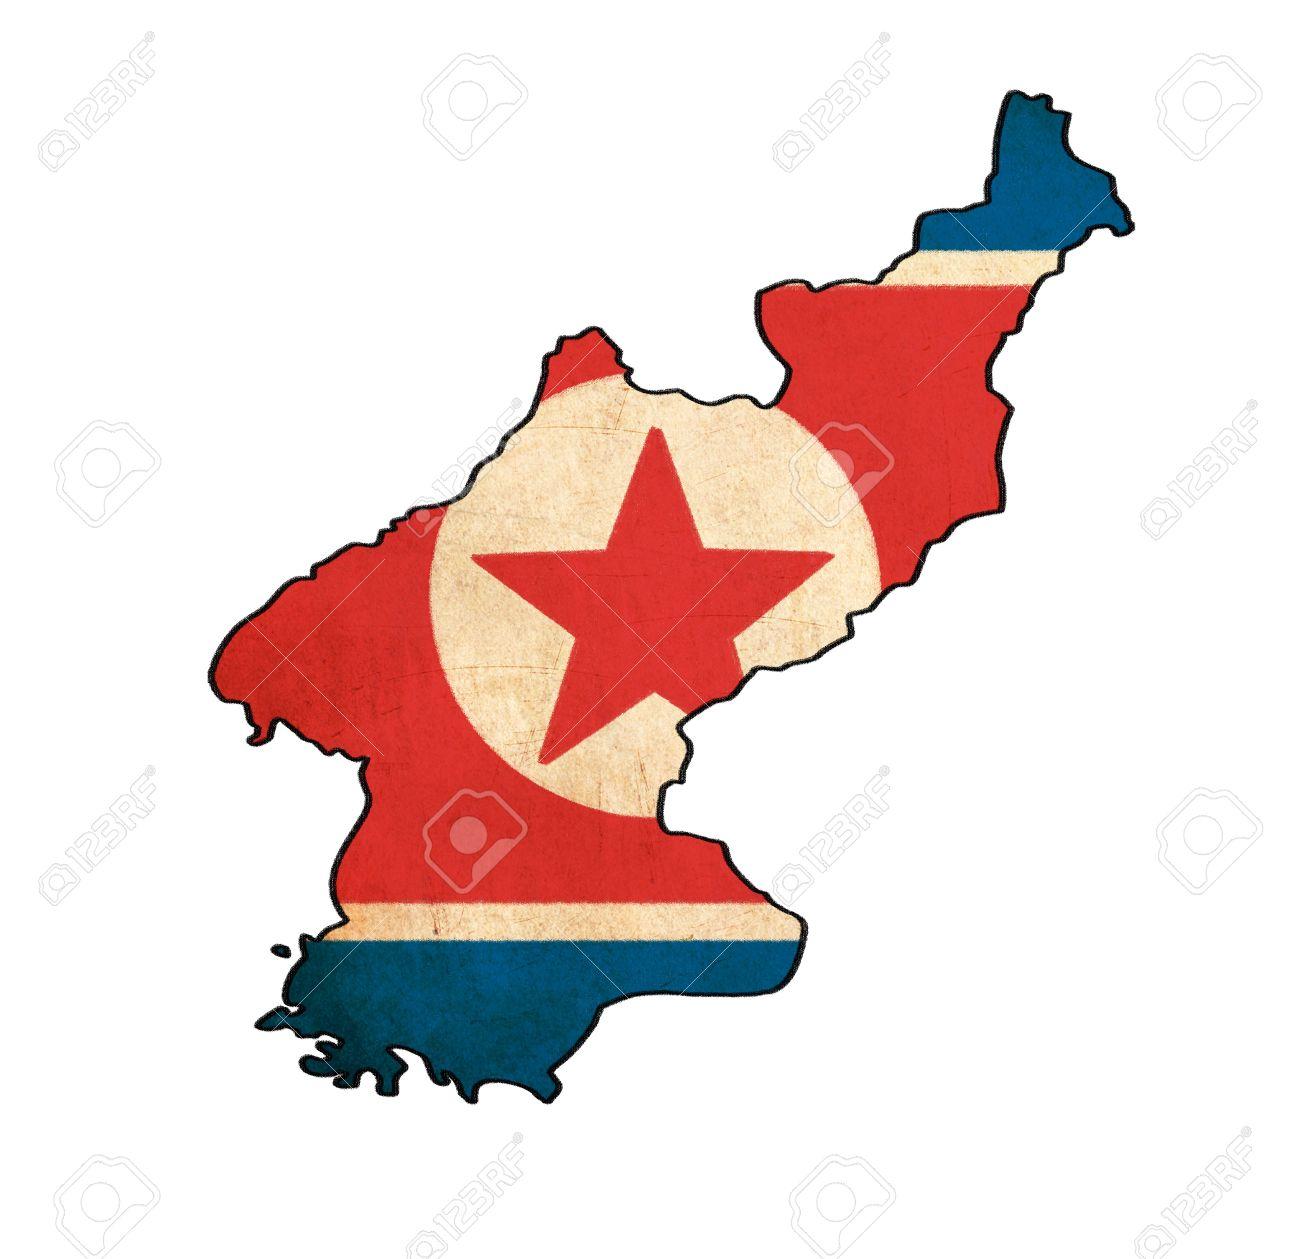 North Korea Map On North Korea Flag Drawing ,grunge And Retro ...